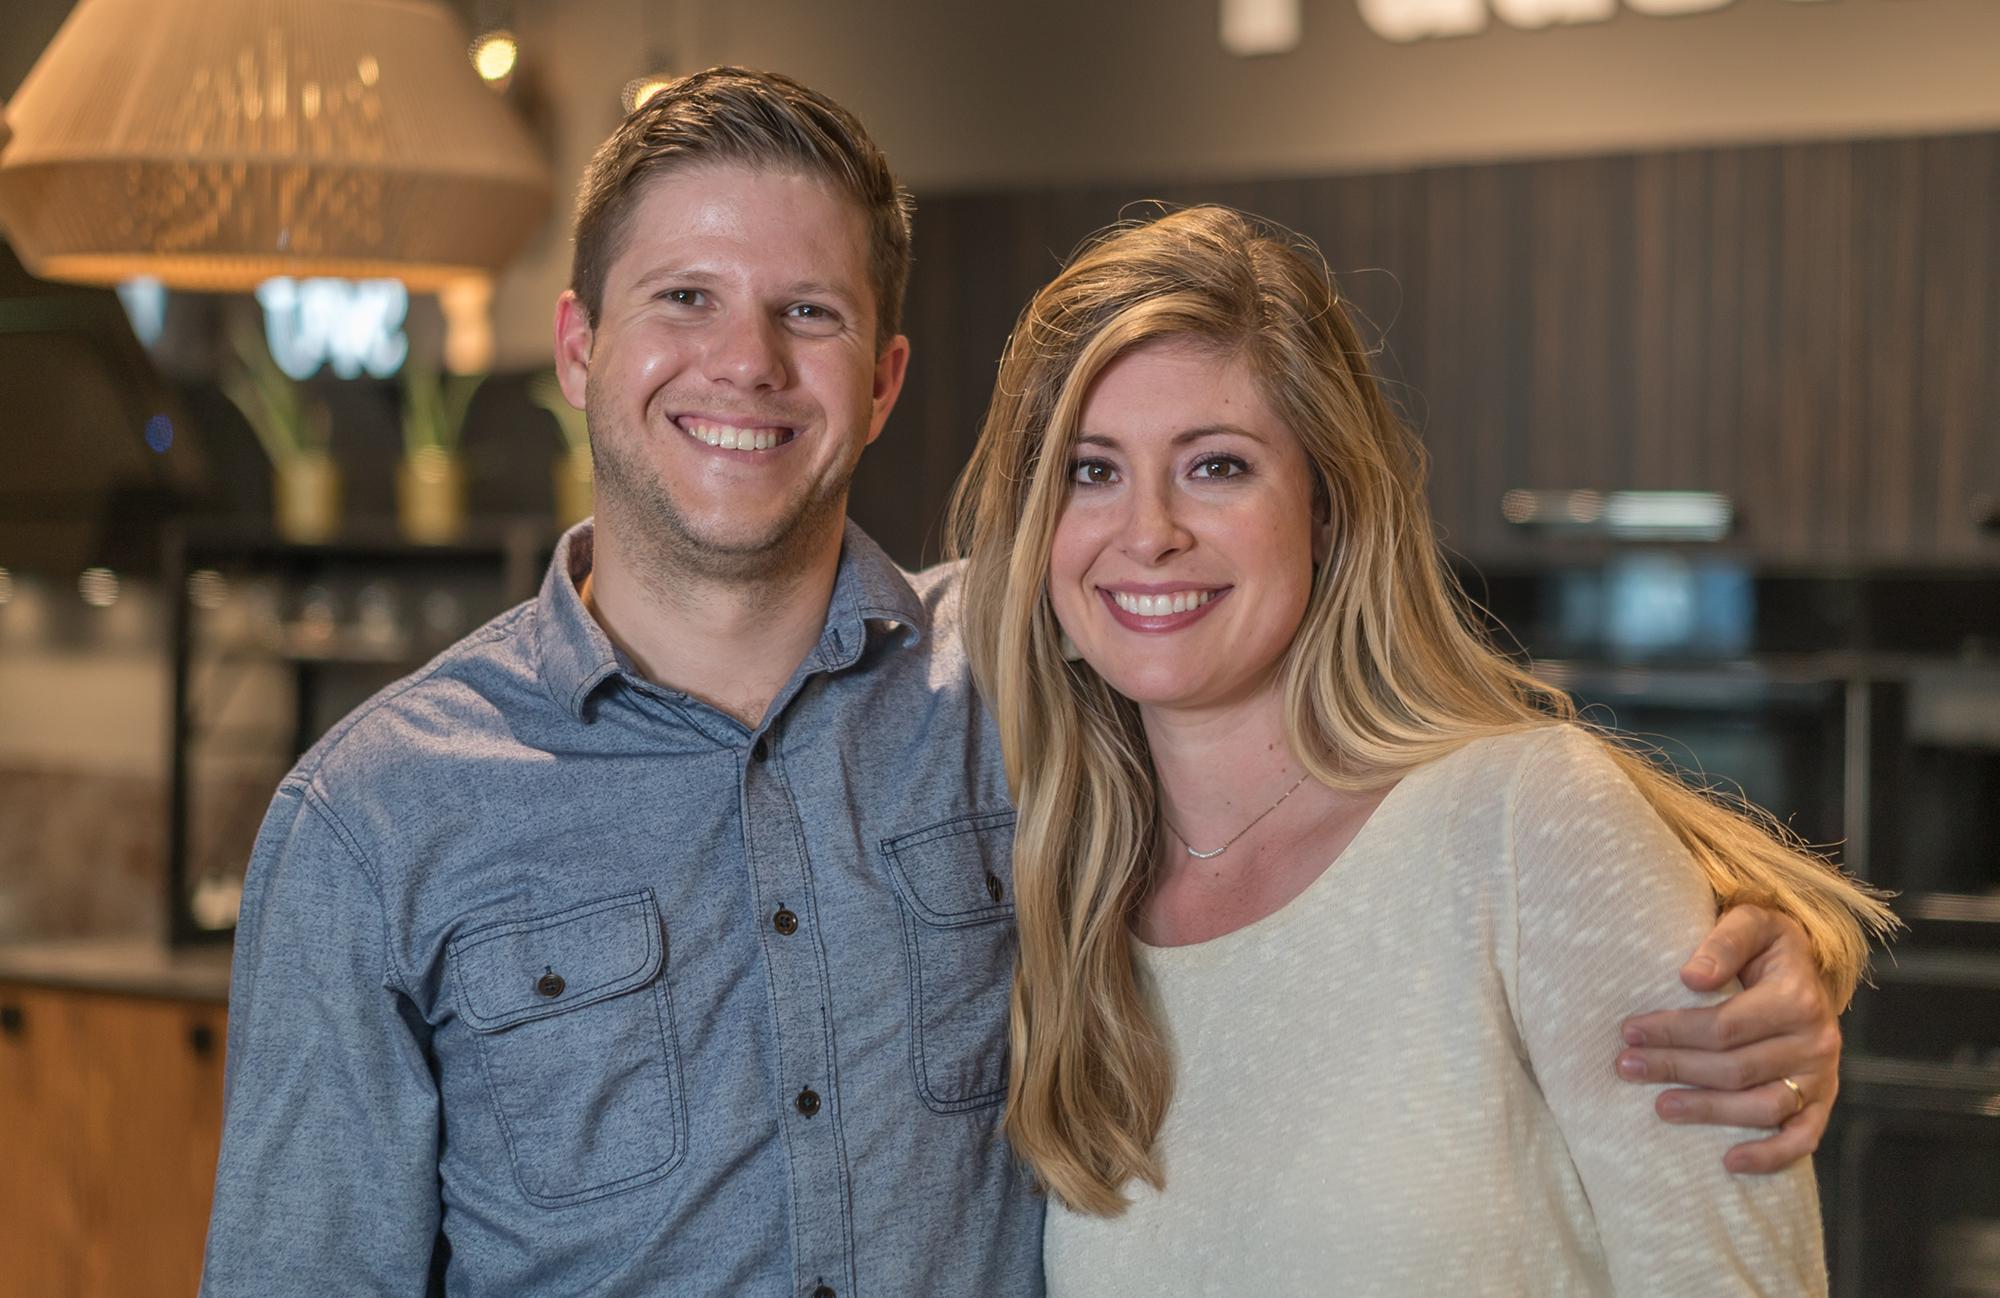 Allison & Sam Werler's experiences of Puustelli USA